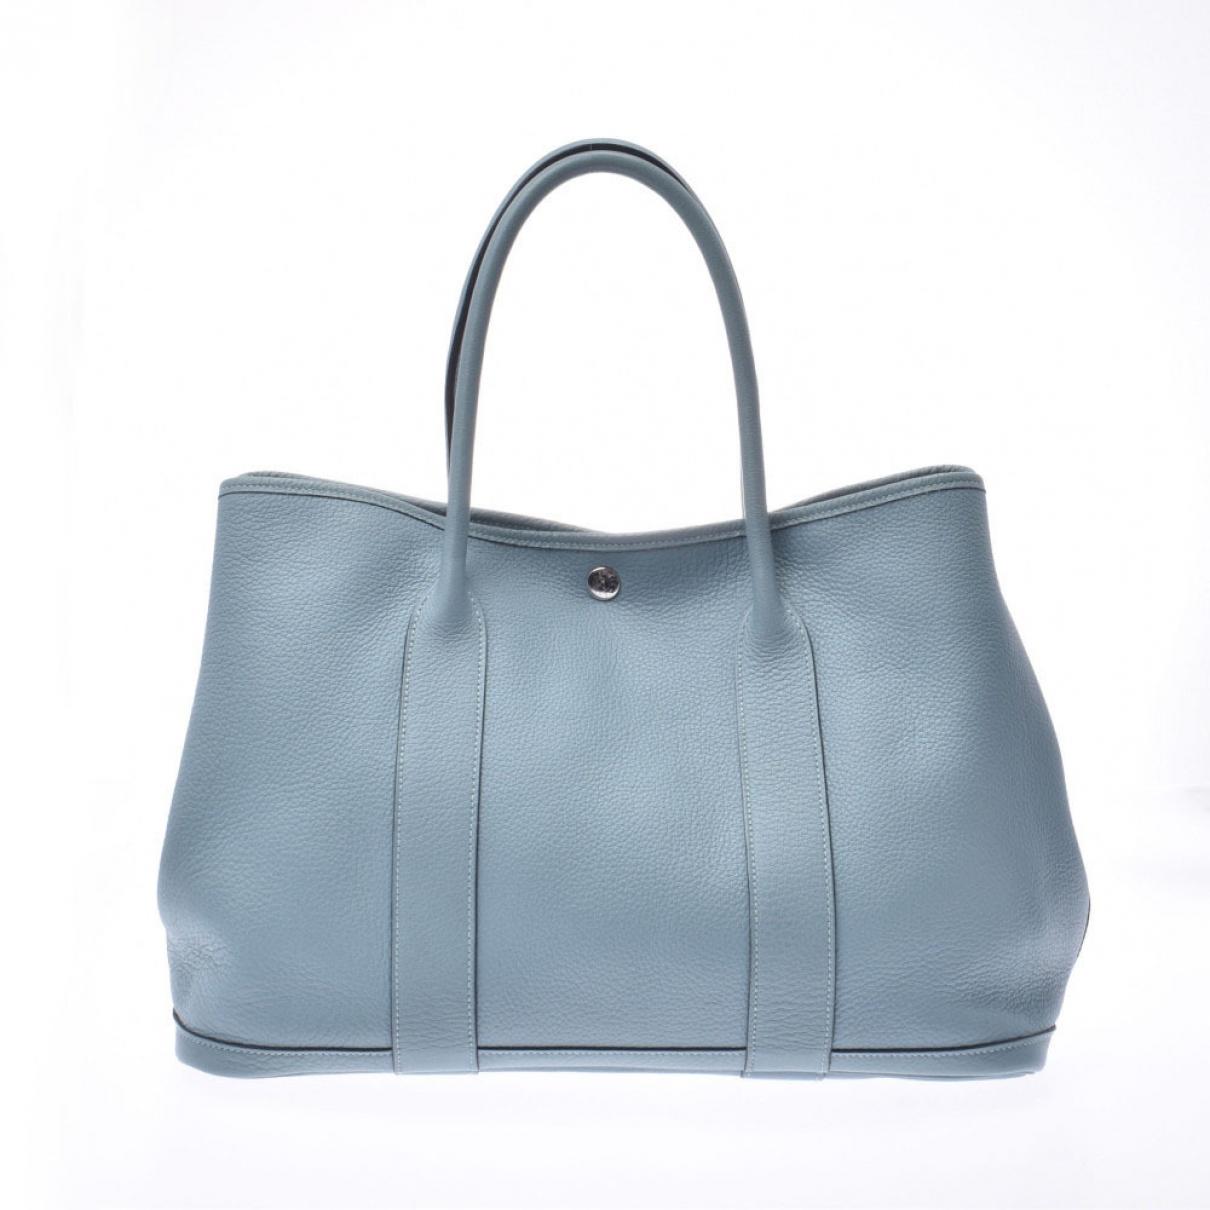 Hermes Garden Party Handtasche in  Blau Leder